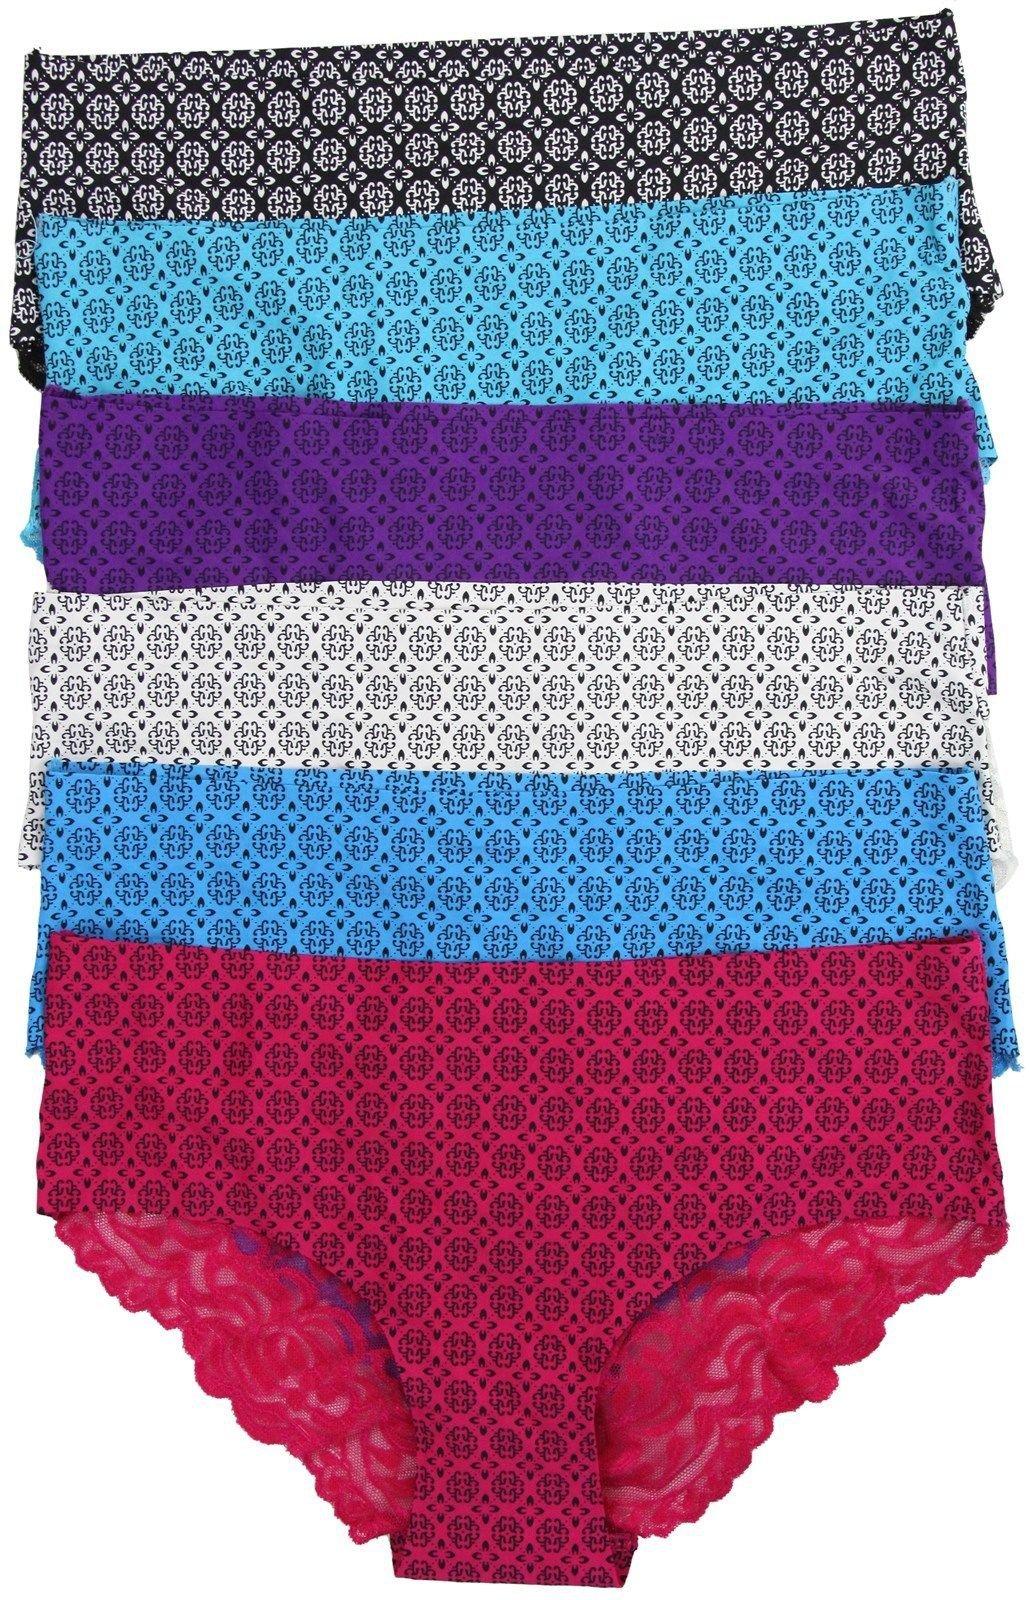 b821d658db3f1 FashionCatch Women s Laser Cut No Show Lace Seamless Panties (6-Pack ...